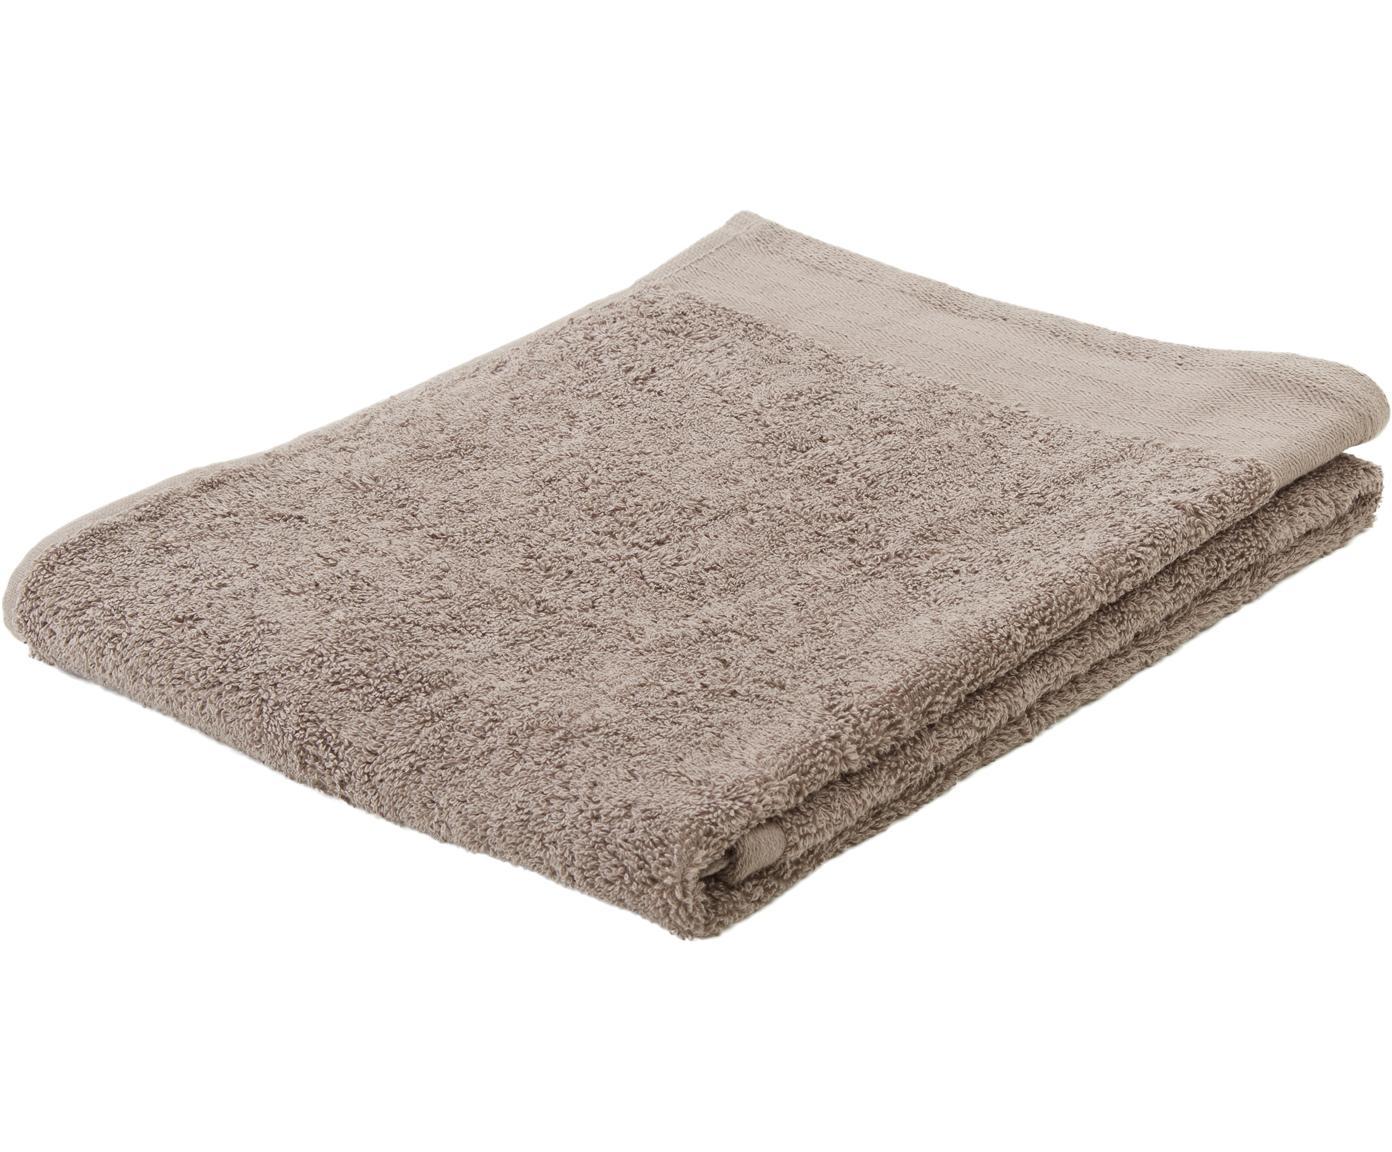 Asciugamano Soft Cotton, Taupe, Asciugamano per ospiti